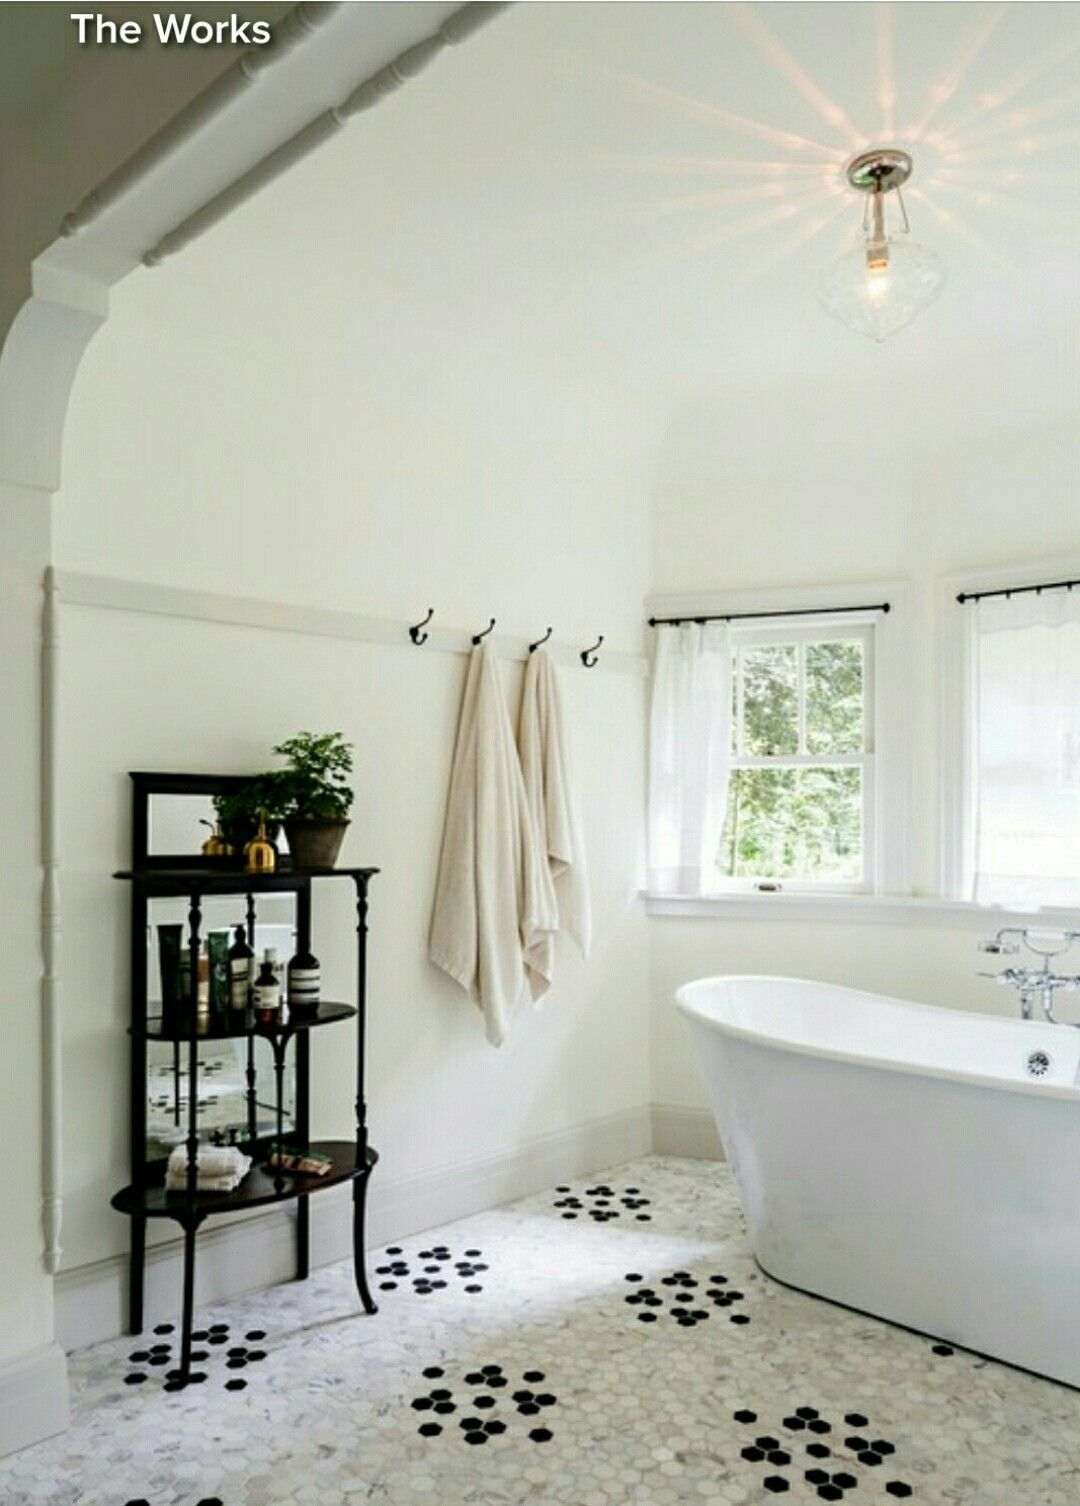 Black in Bathroom Houzz | Art | Pinterest | Houzz